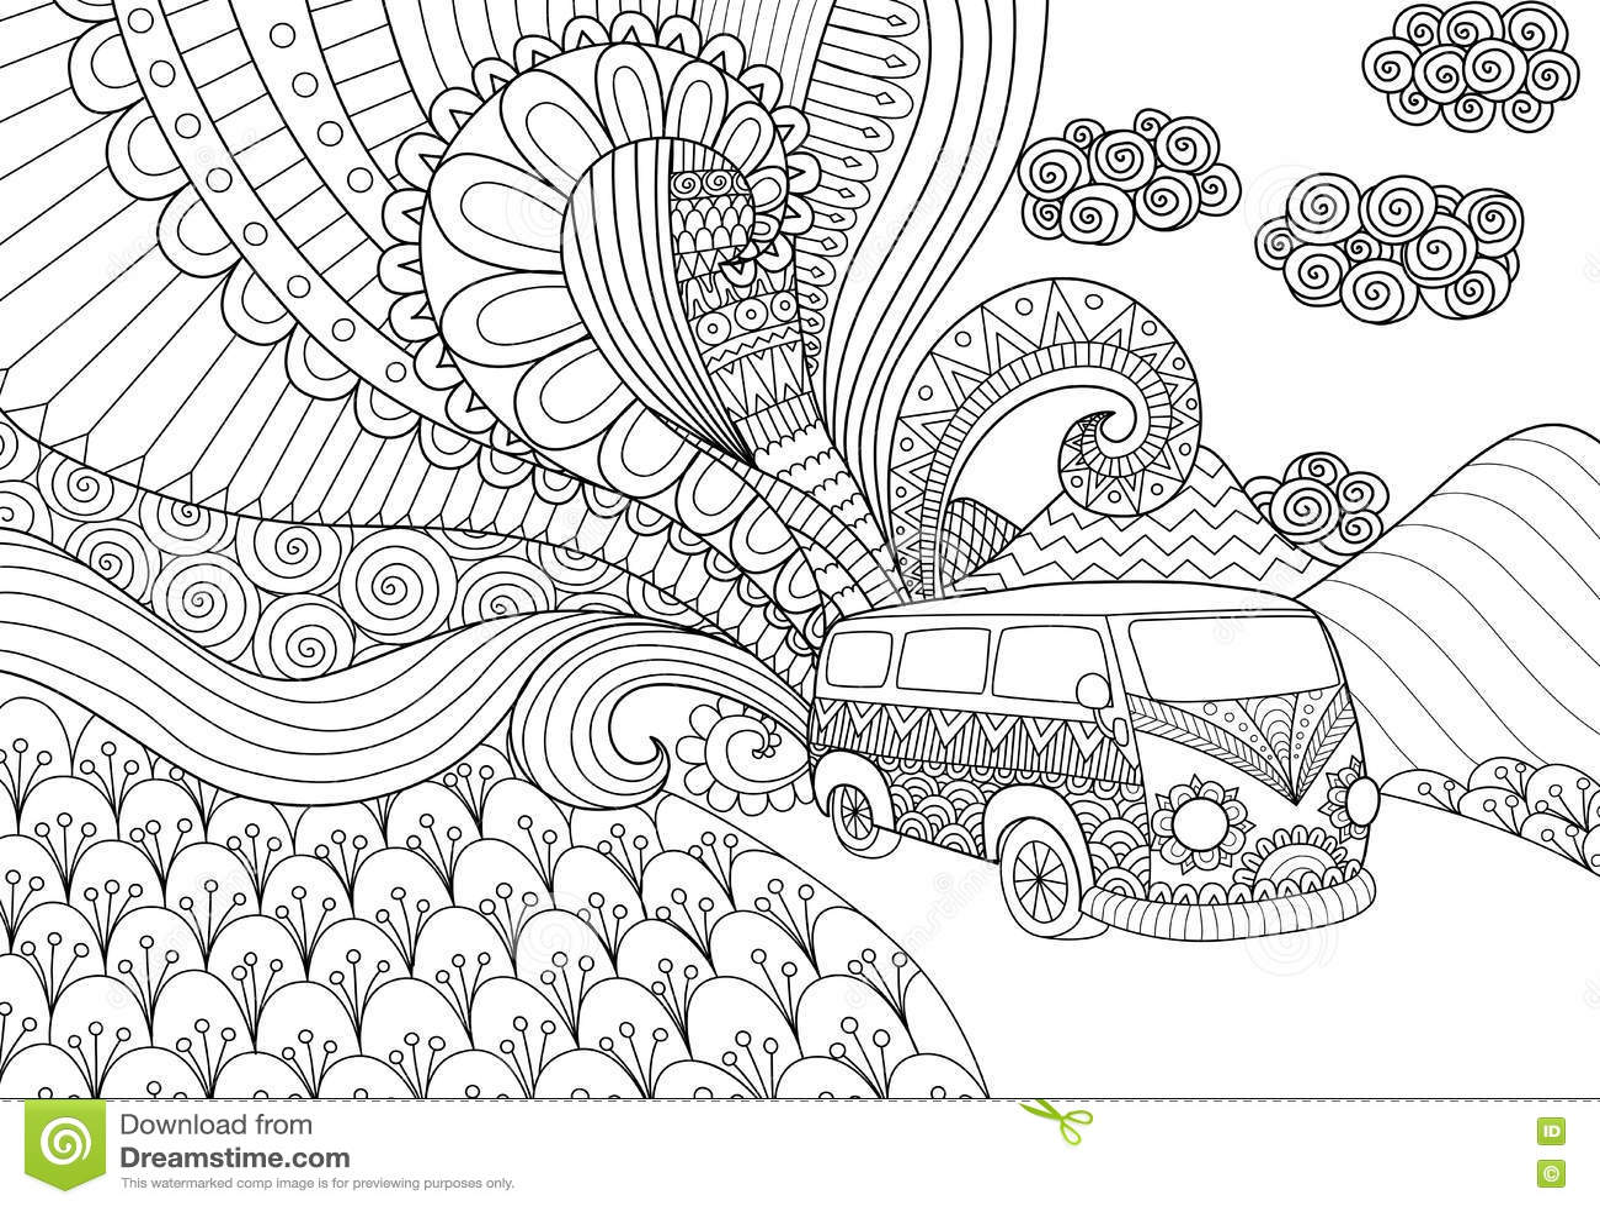 Doodles design of piano for coloring book for adult for Disegni da colorare paesaggi marini